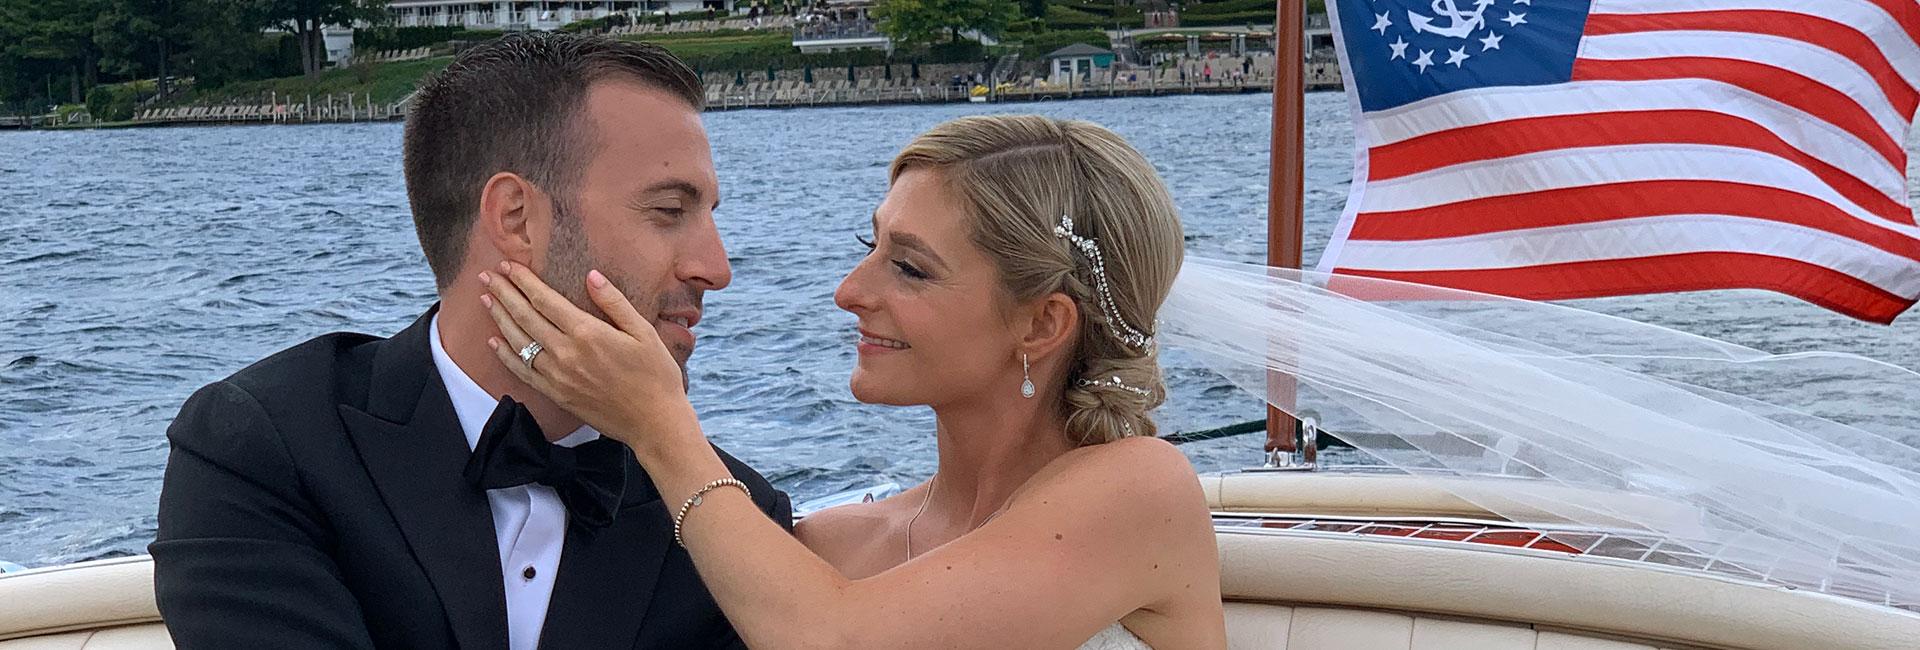 Wedding photo shoot aboard the Miss Boathouse